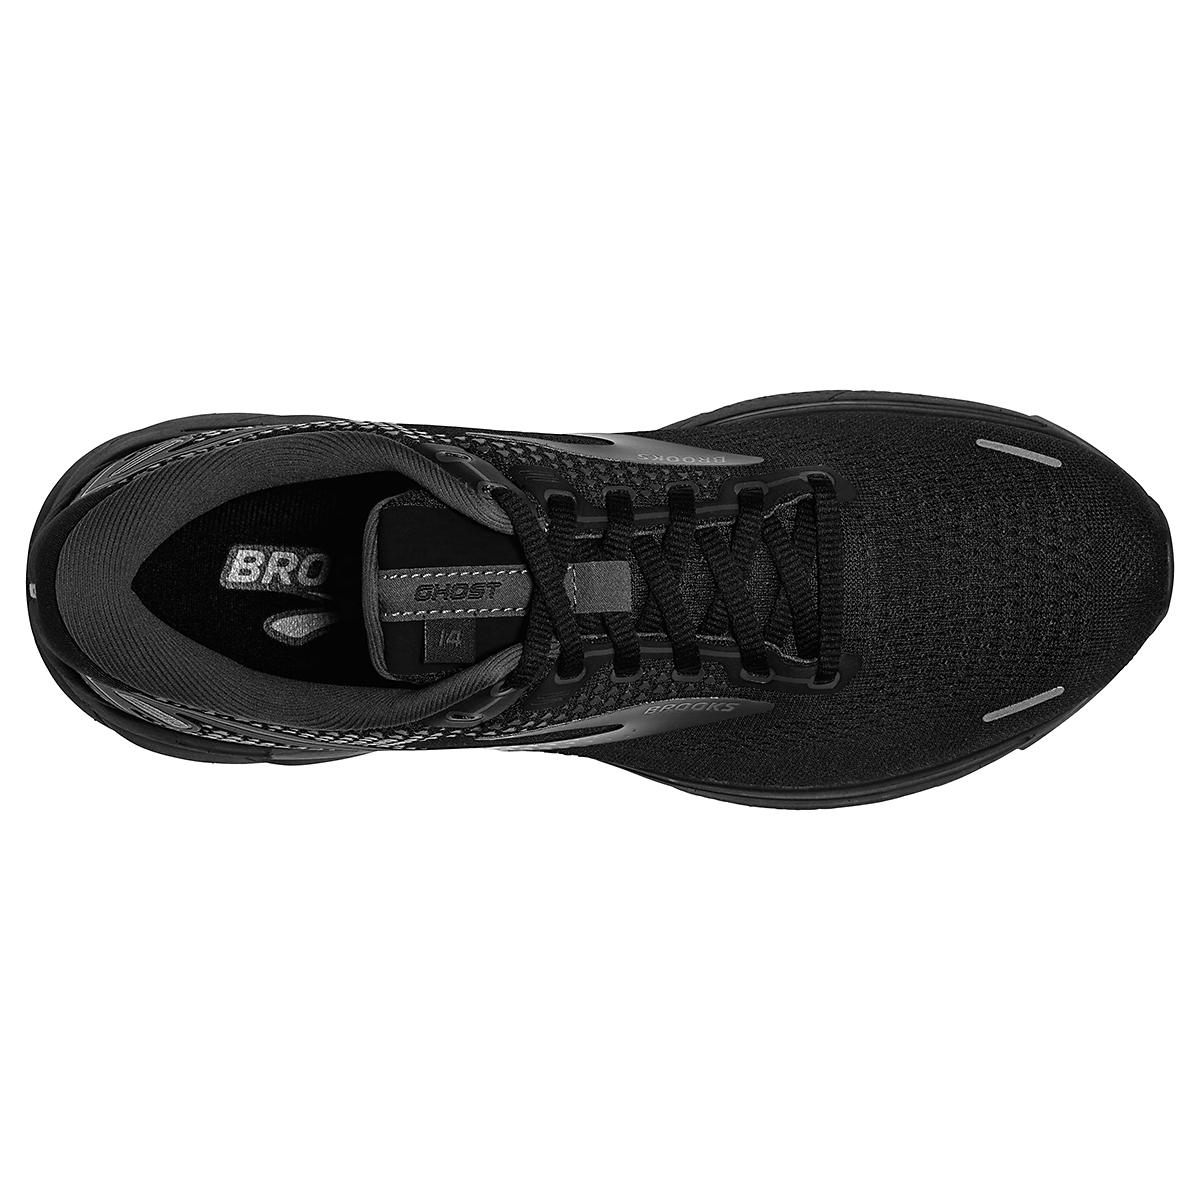 Men's Brooks Ghost 14 Running Shoe - Color: Black/Black/Ebony - Size: 7 - Width: Regular, Black/Black/Ebony, large, image 3